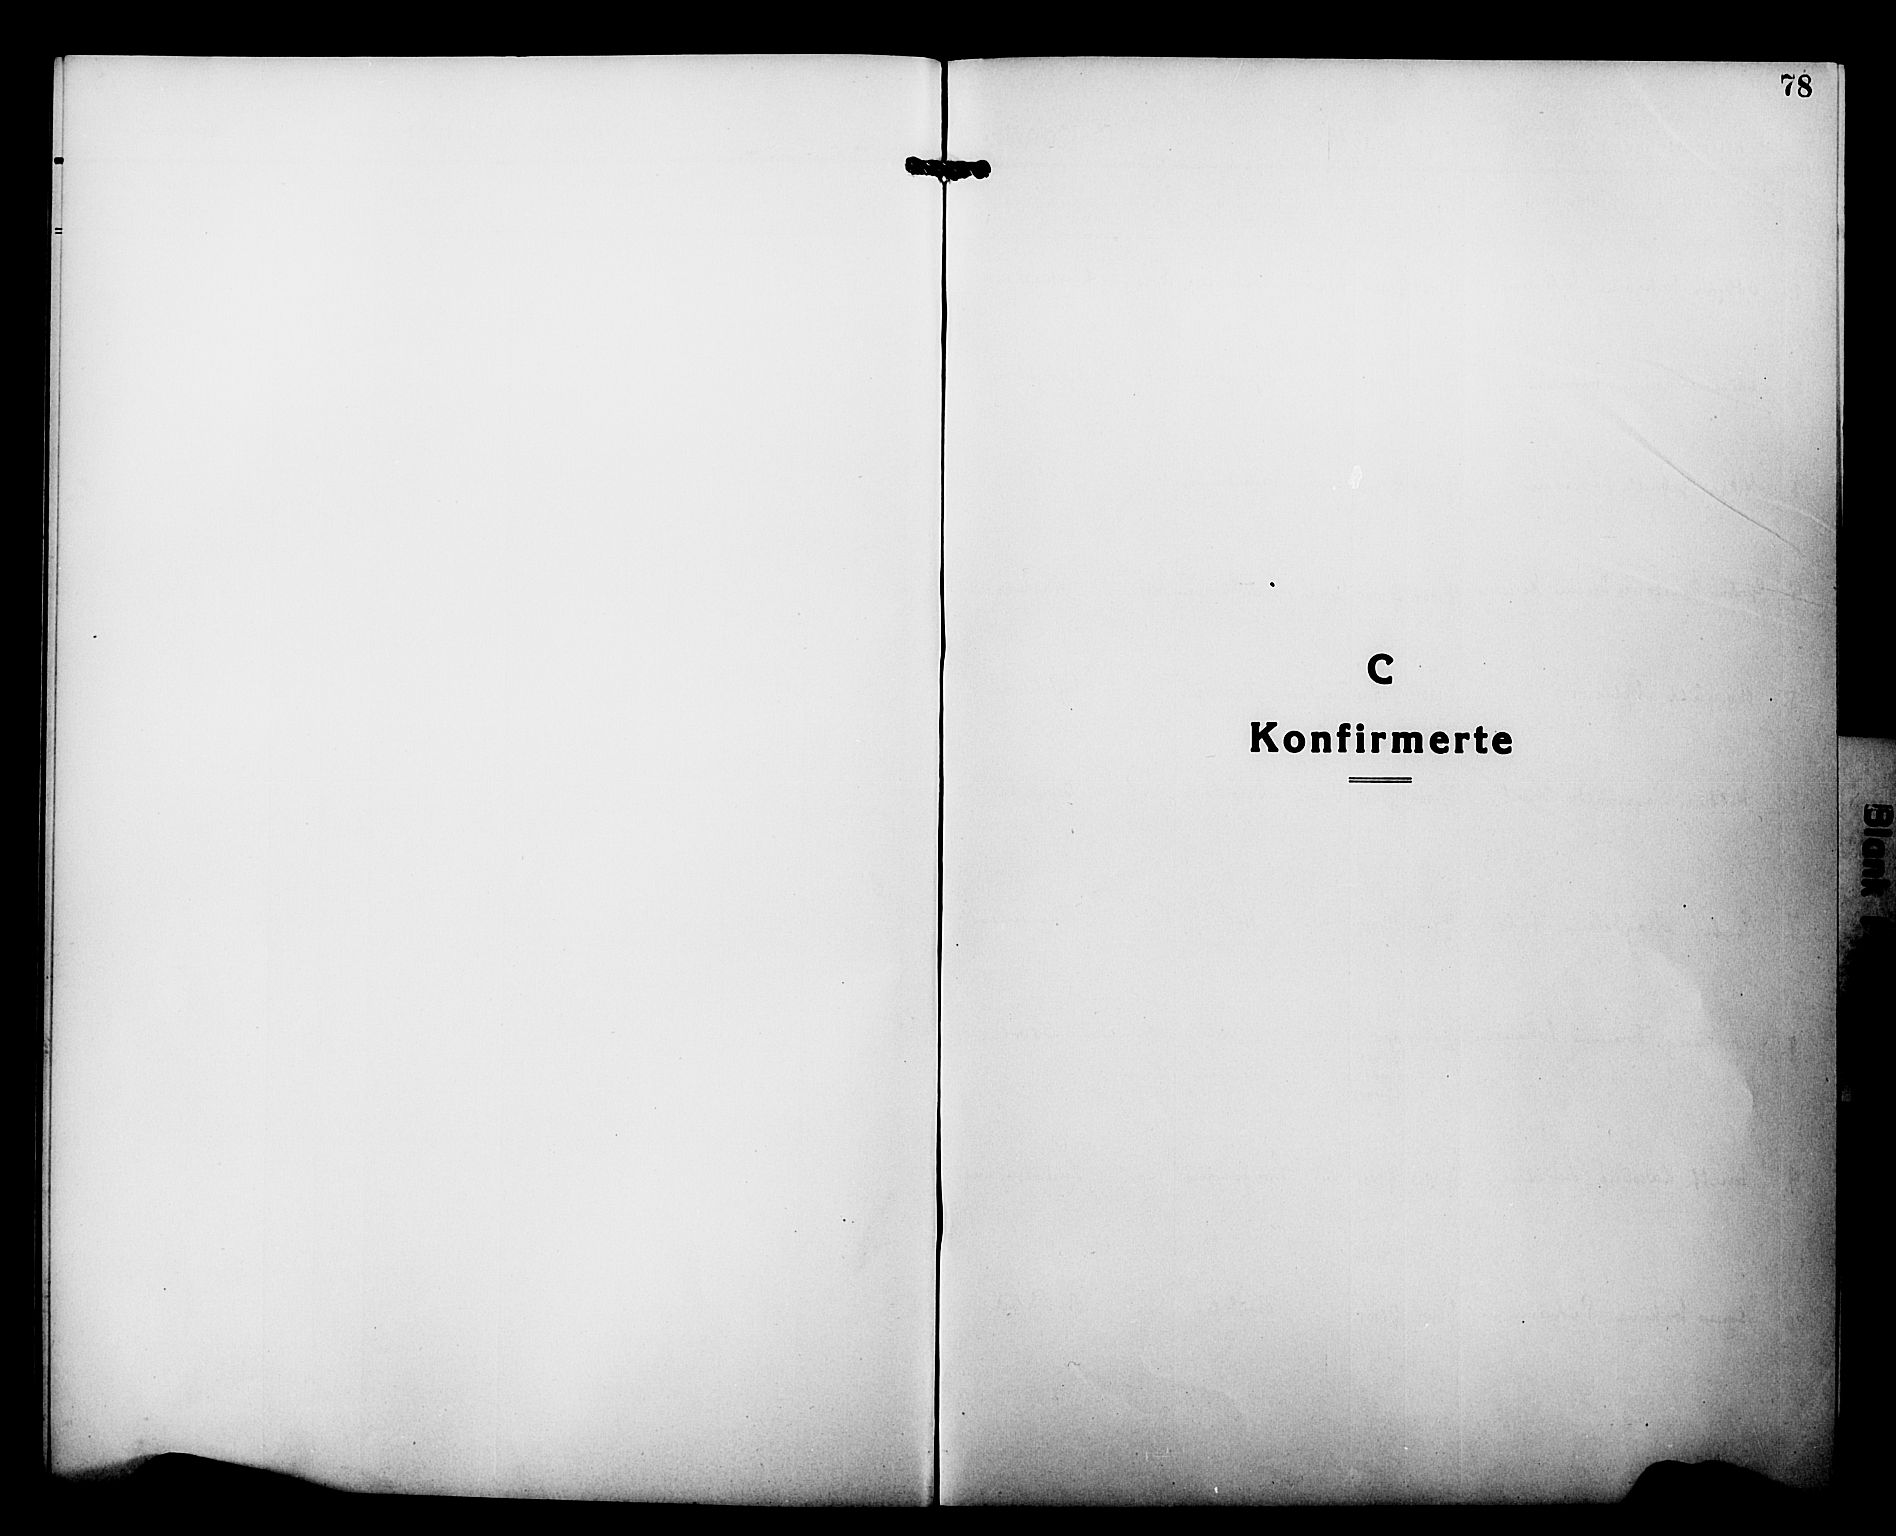 SATØ, Tranøy sokneprestkontor, I/Ia/Iab/L0015klokker: Klokkerbok nr. 15, 1918-1930, s. 78